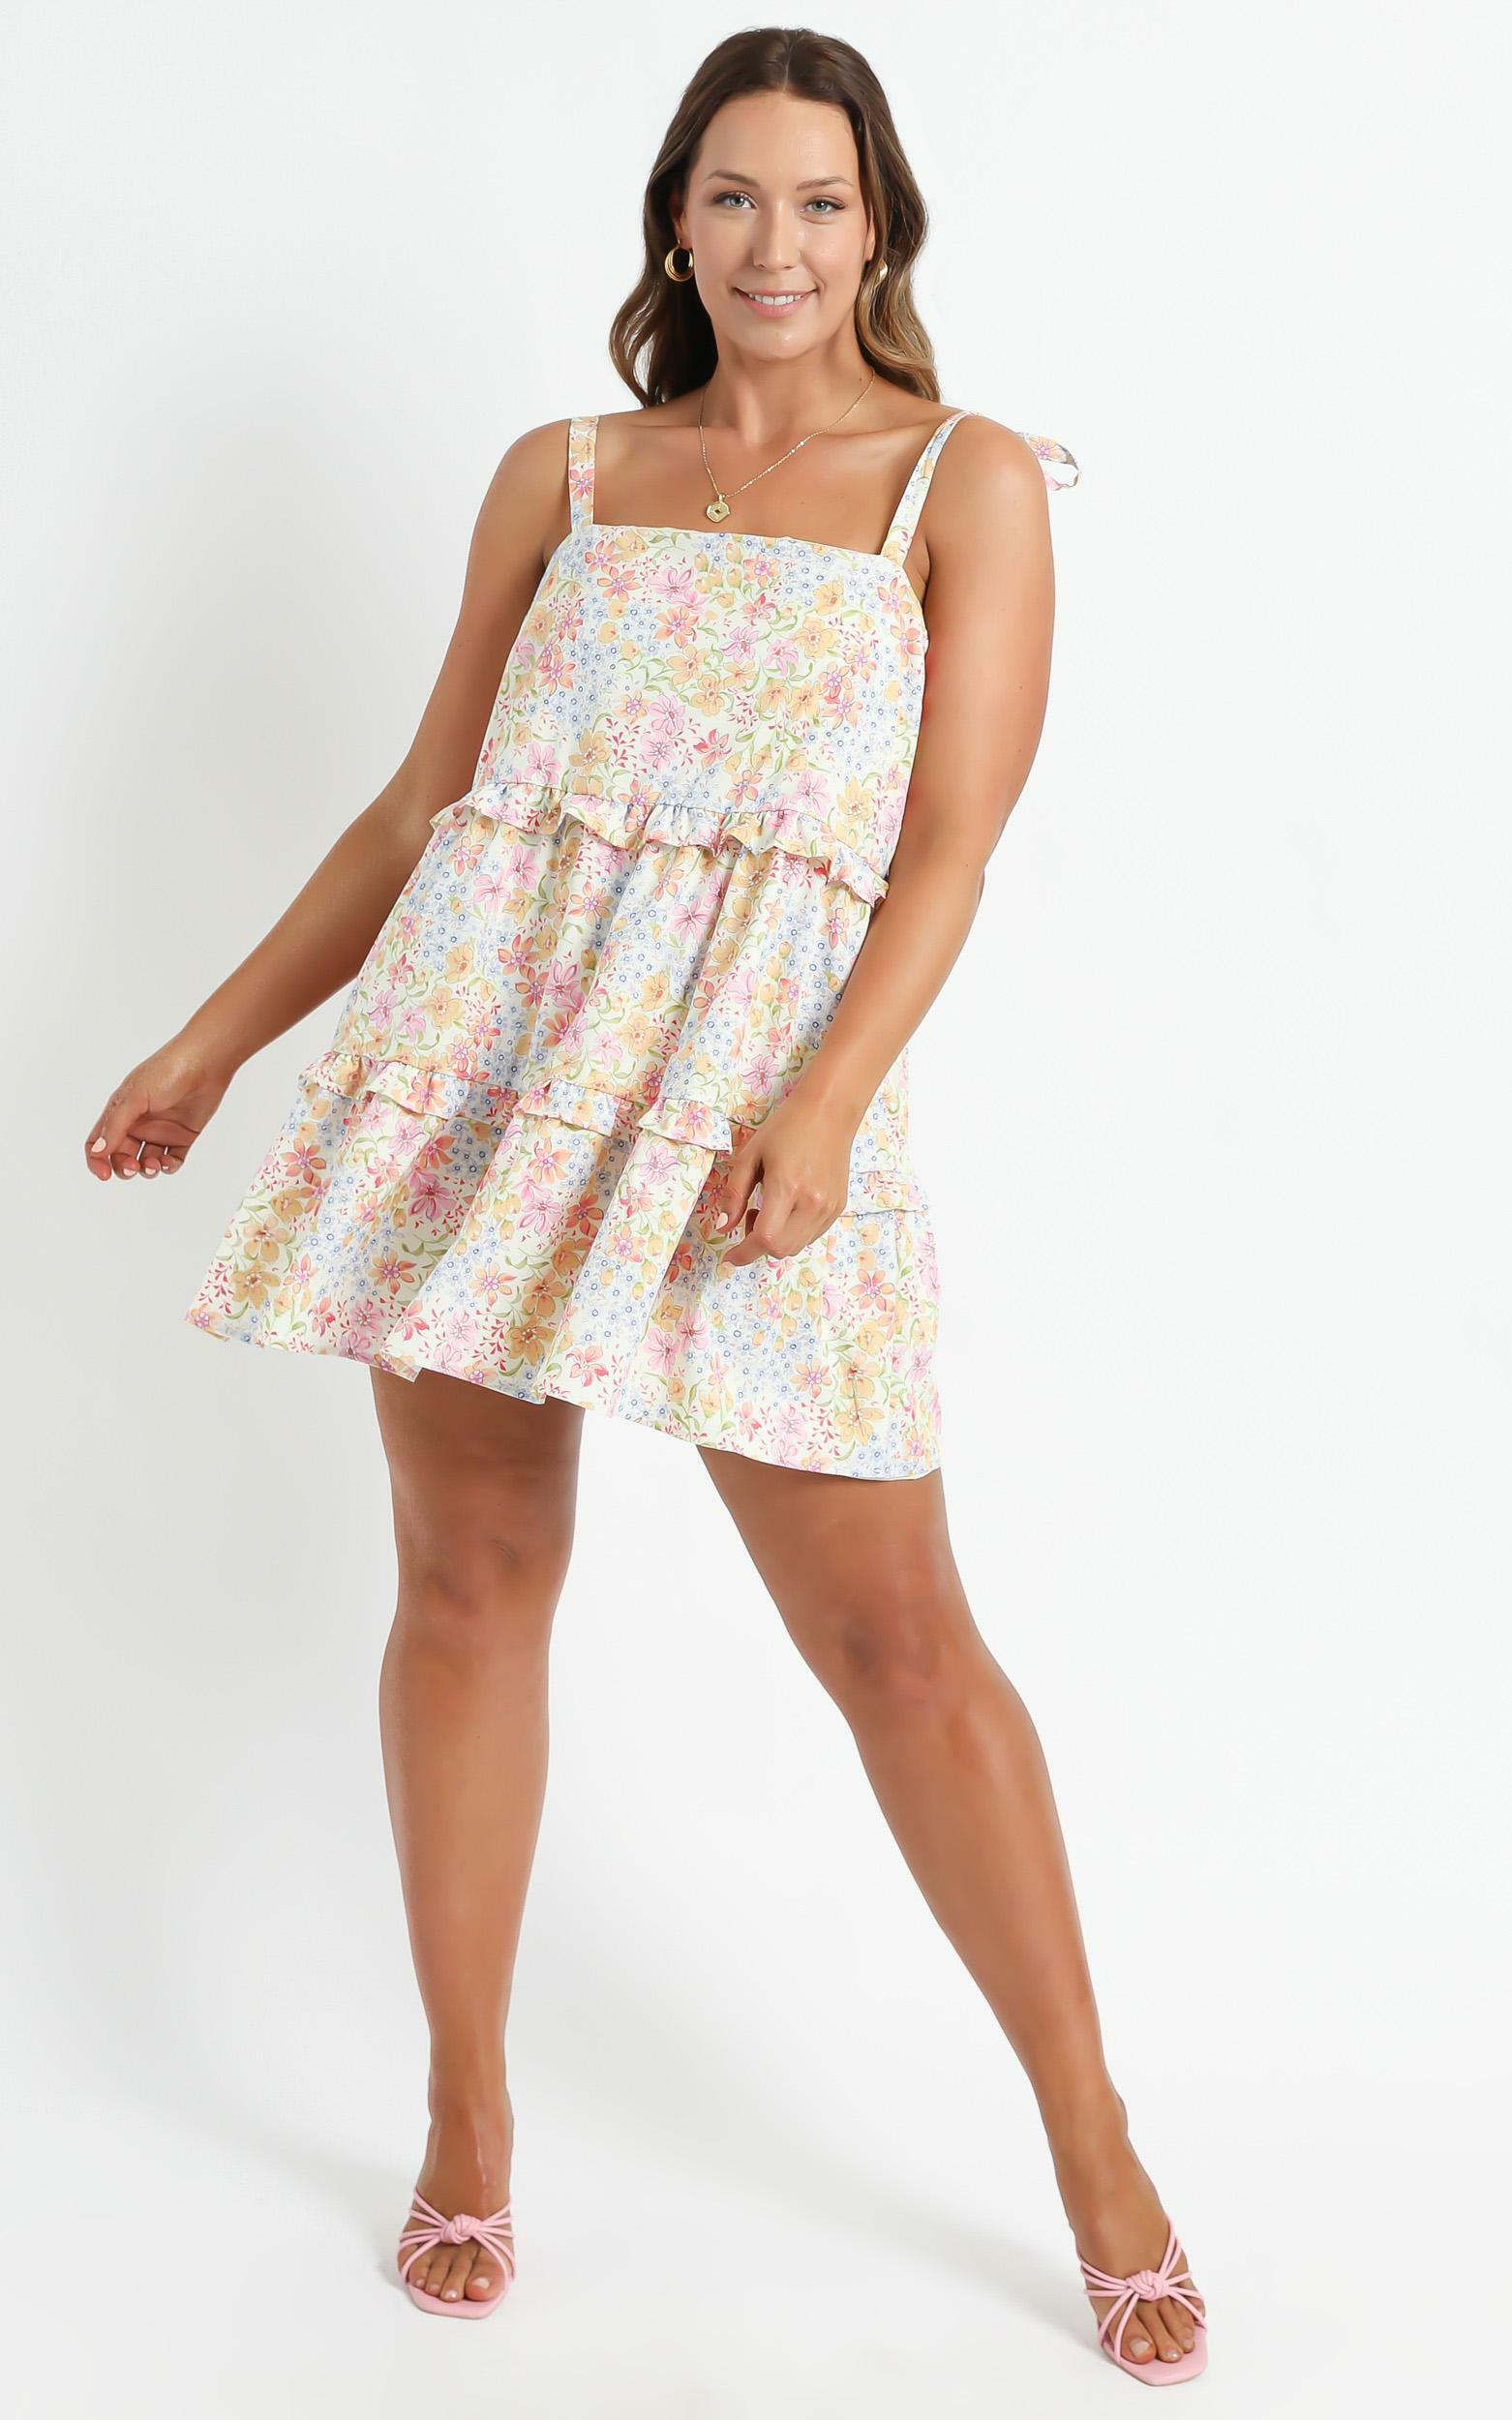 Alimia Dress in Multi Floral - 06, MLT1, hi-res image number null